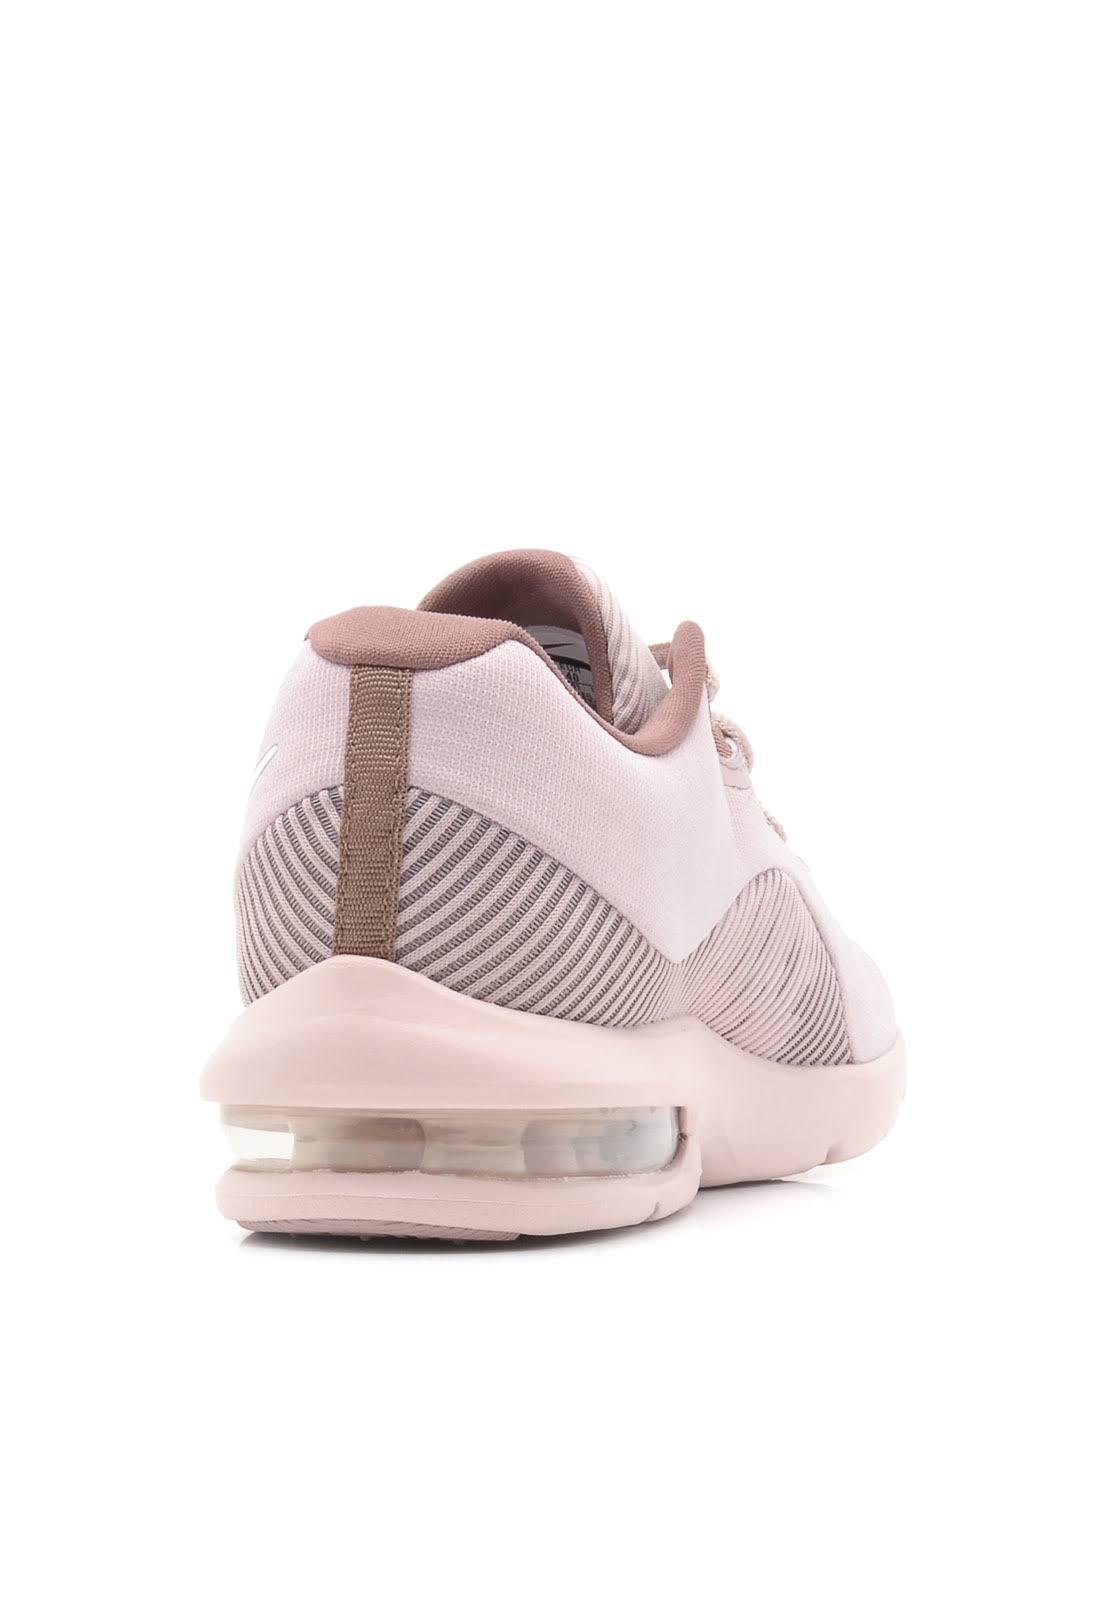 Rosa Advantage Max Tênis Nike Bege Air 2 Feminino ZWqa1wp